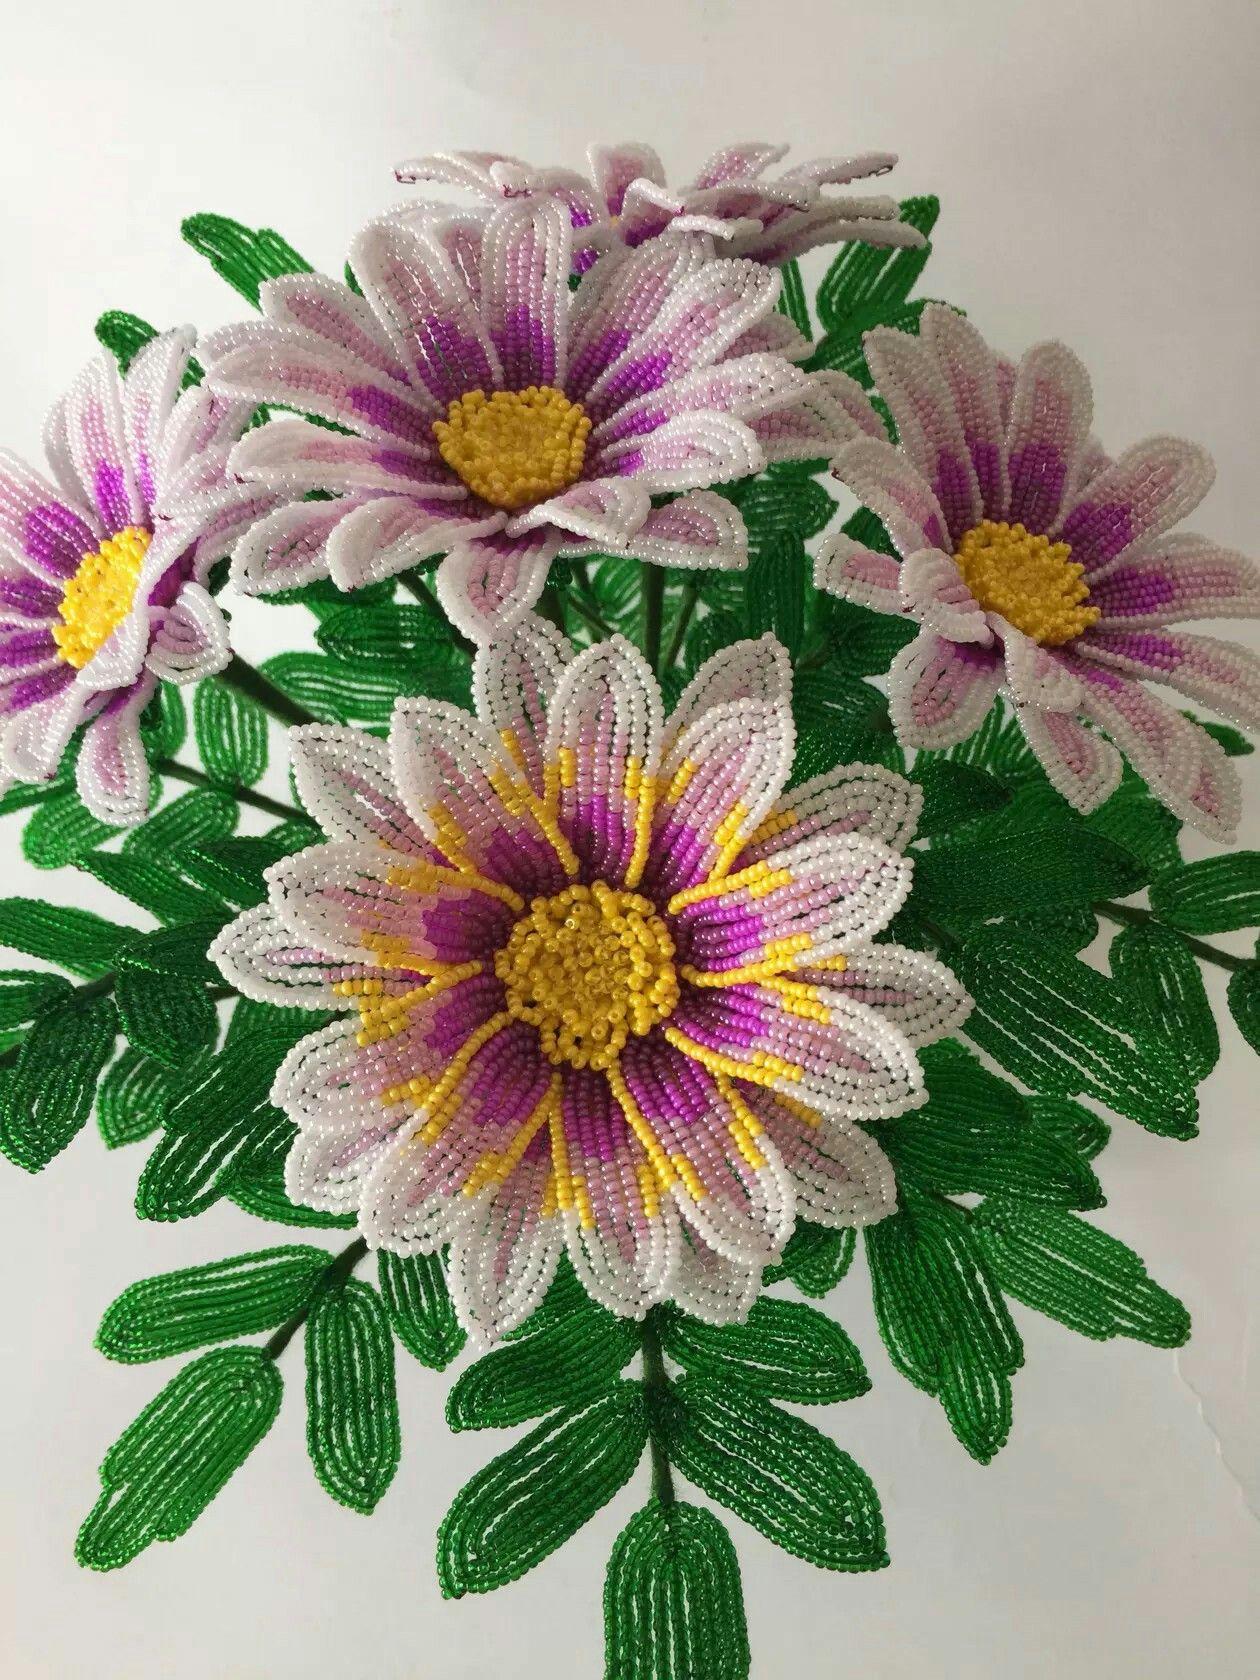 Pin von Asiral Couture Flowers auf Beading Flowers | Pinterest ...